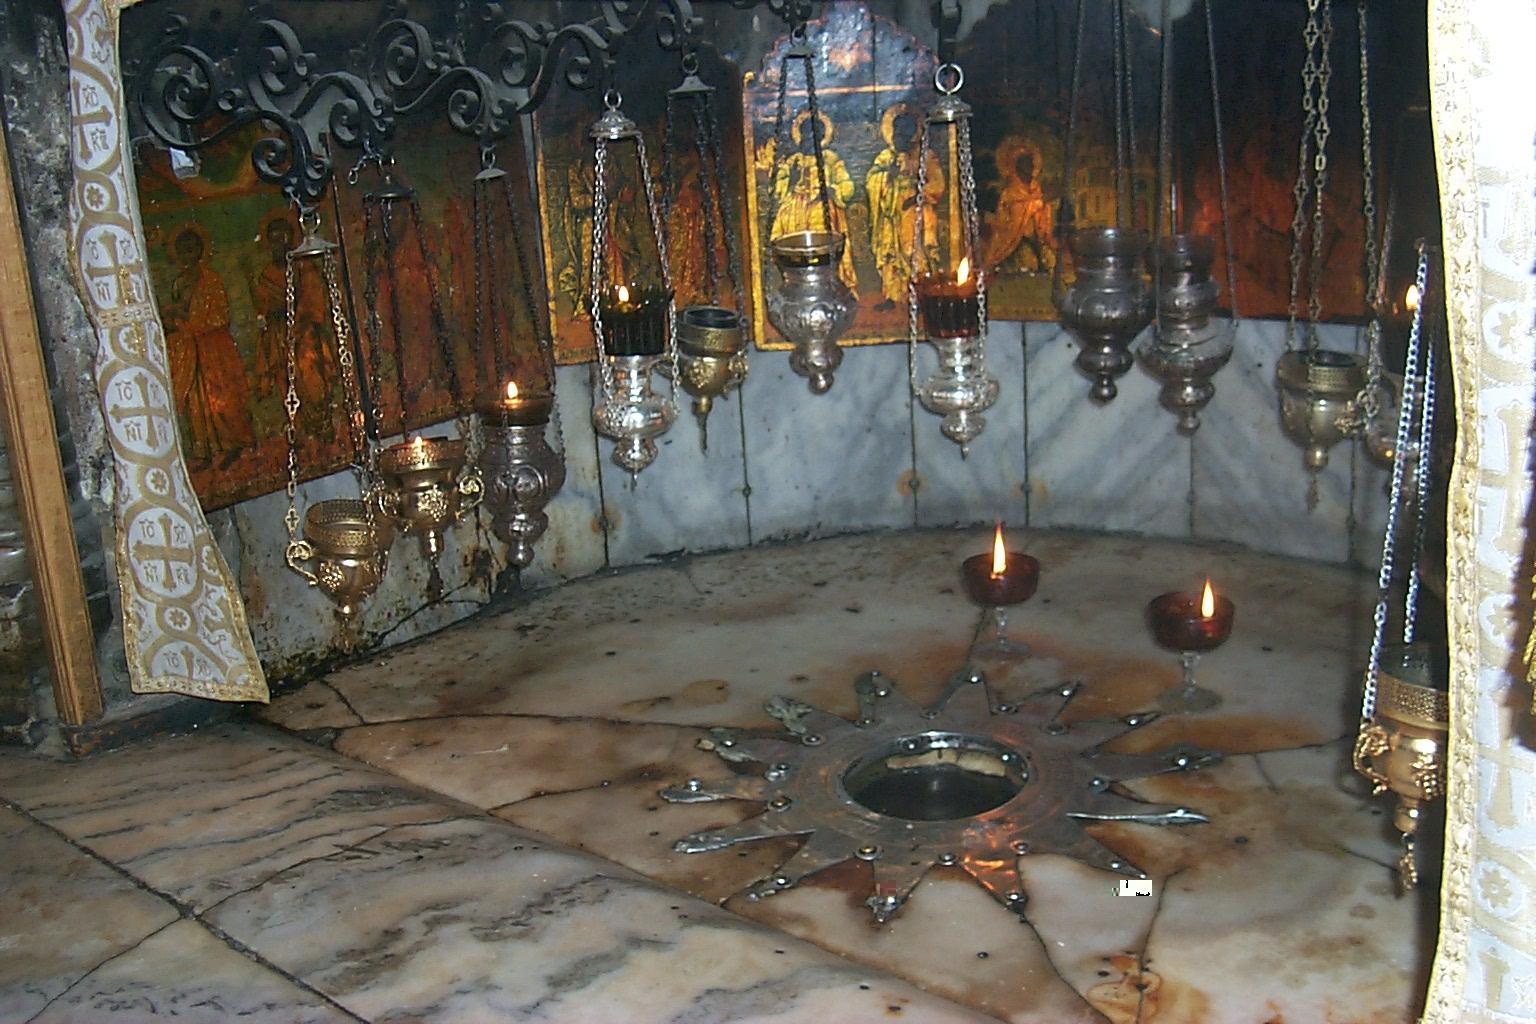 Church of Nativity - Bethlehem Cave